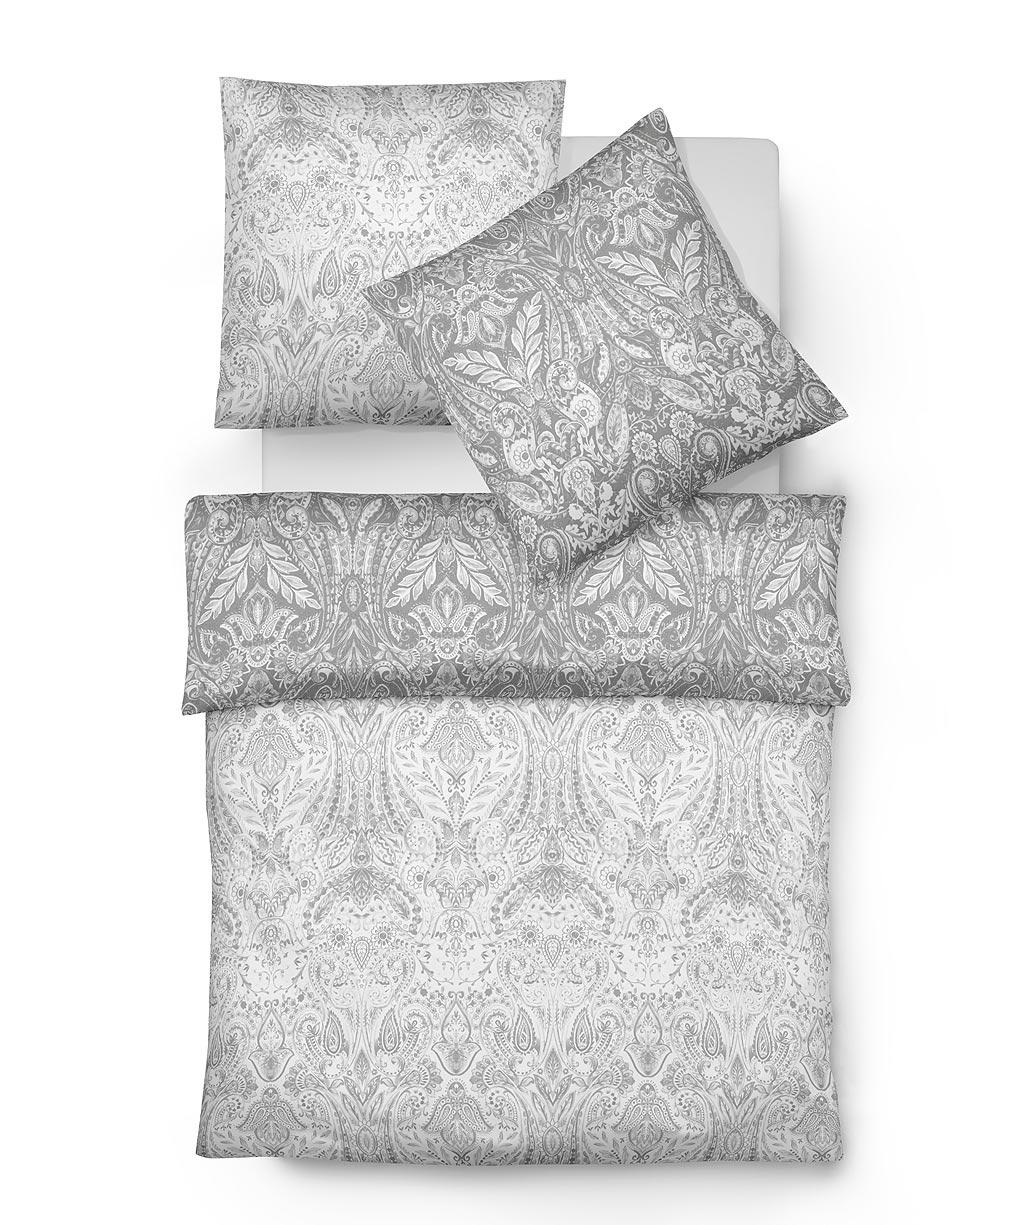 155x220 80x80 new mako satin fleuresse neue kollektion bettw sche ladyproject. Black Bedroom Furniture Sets. Home Design Ideas